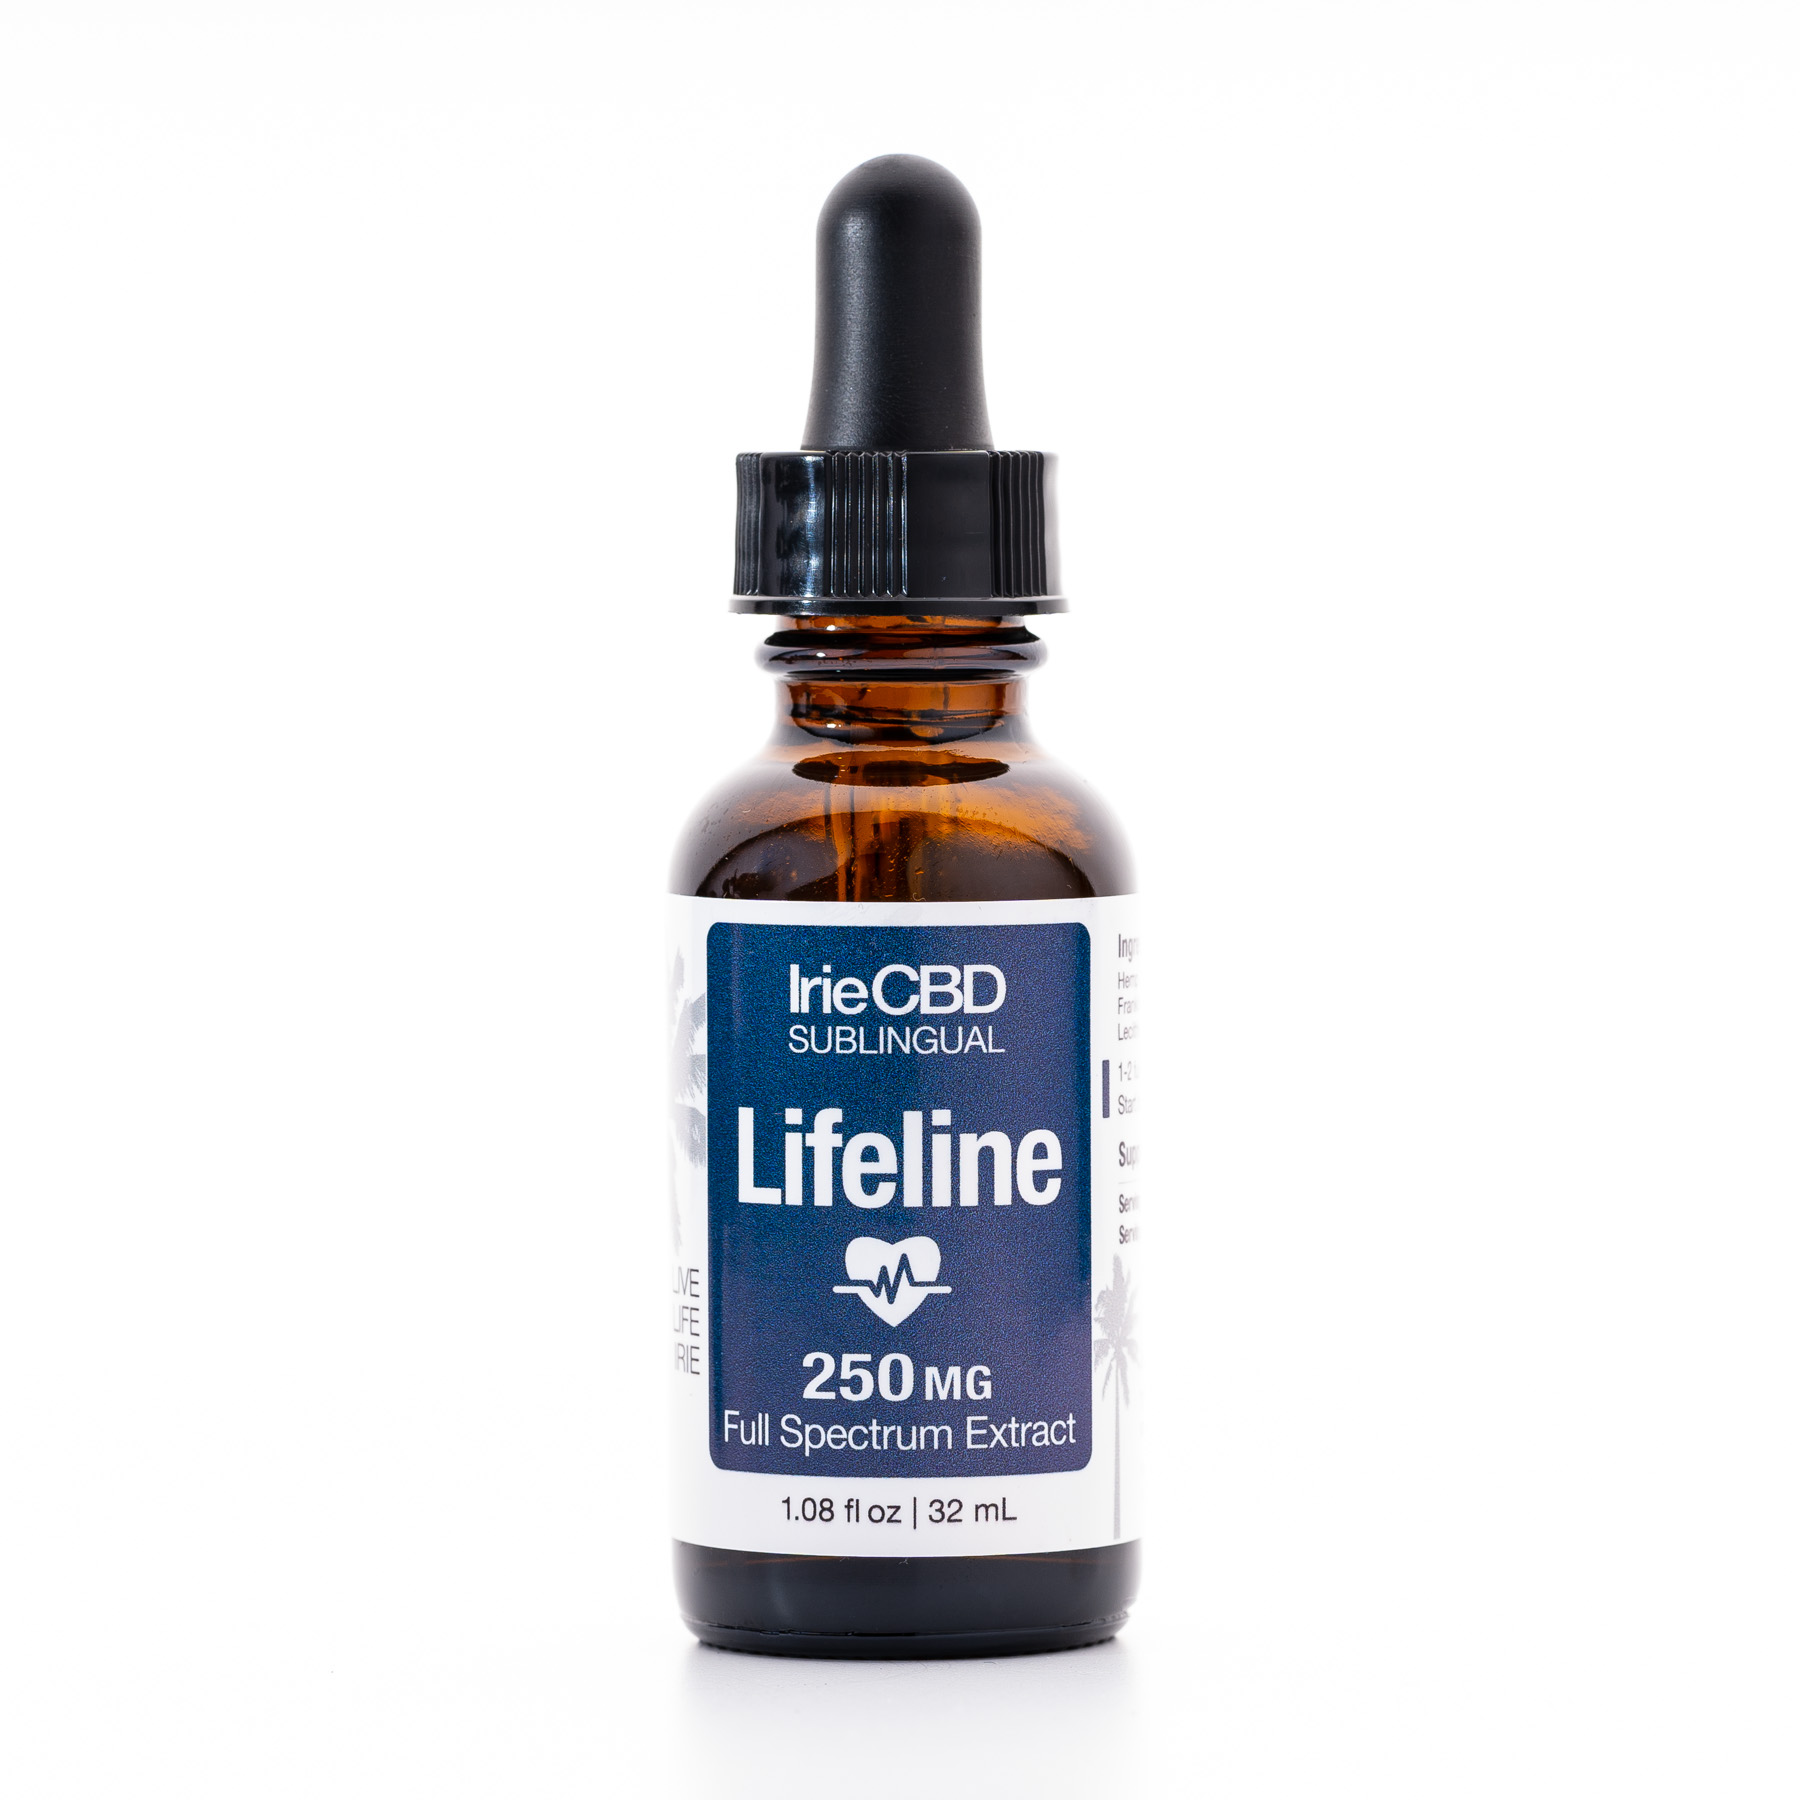 Lifeline 250mg CBD Oil Tincture Irie CBD